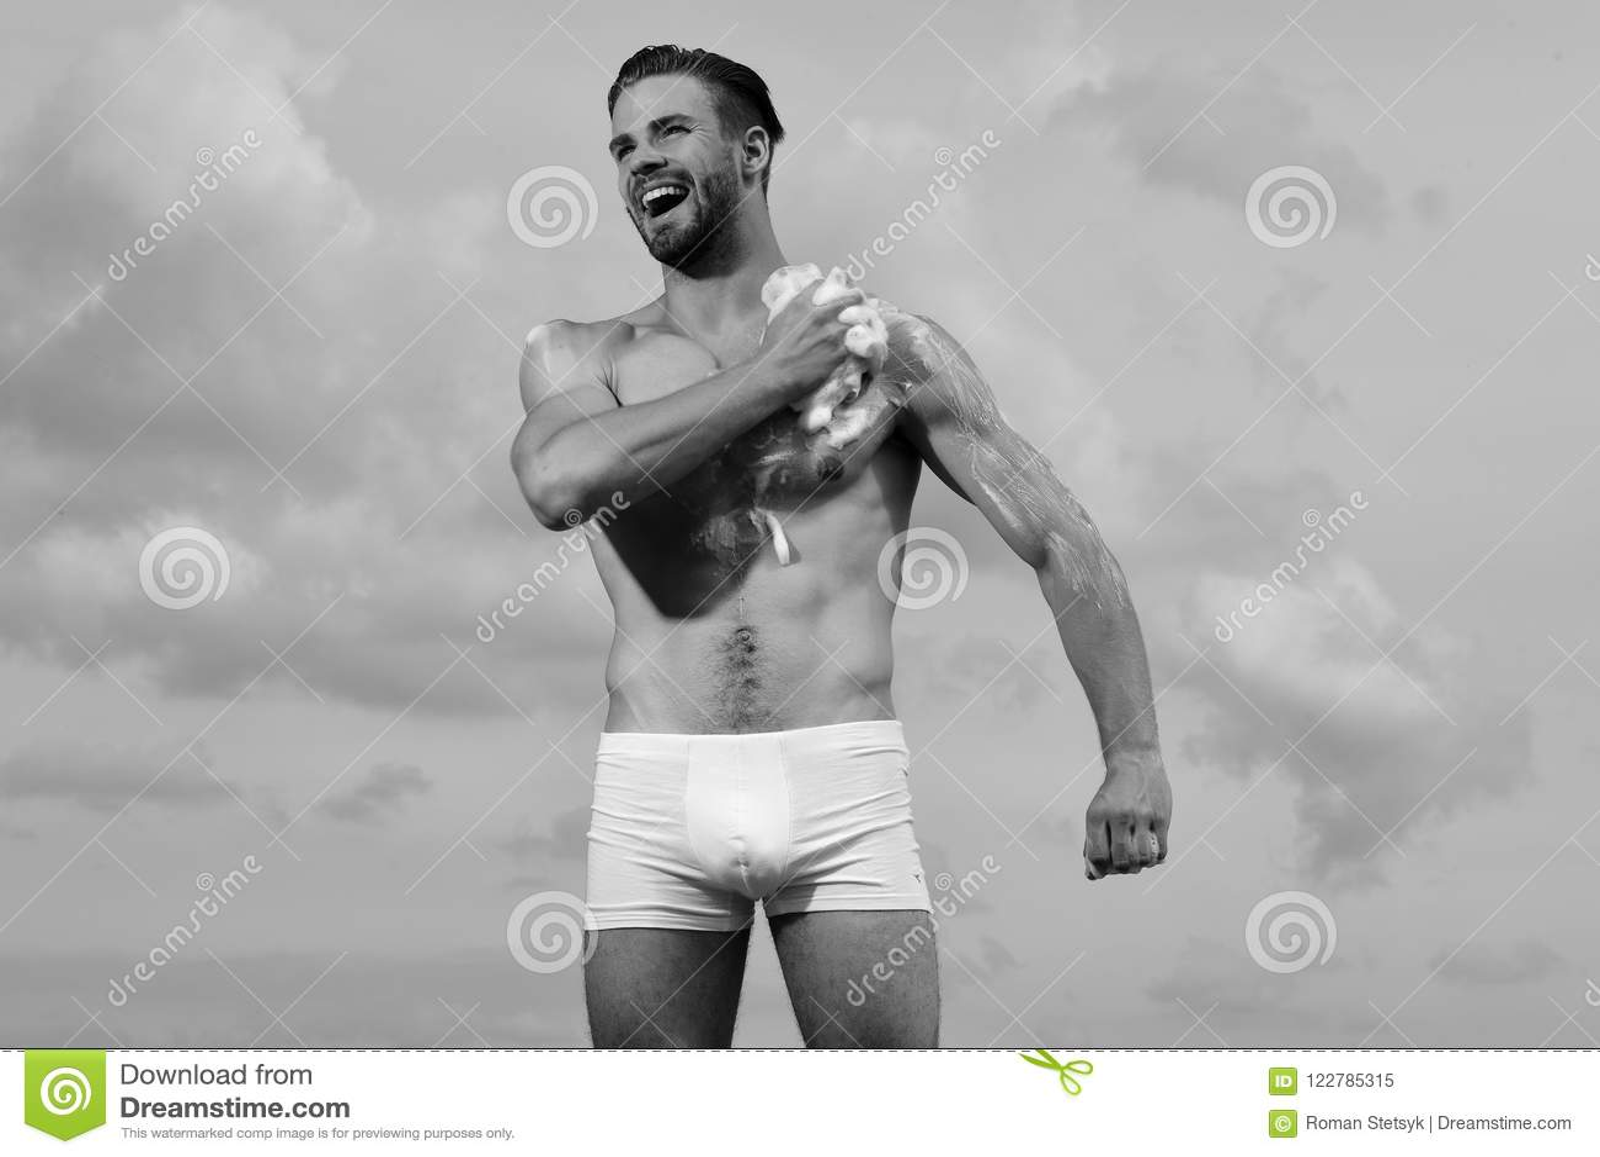 Big dick anal pics